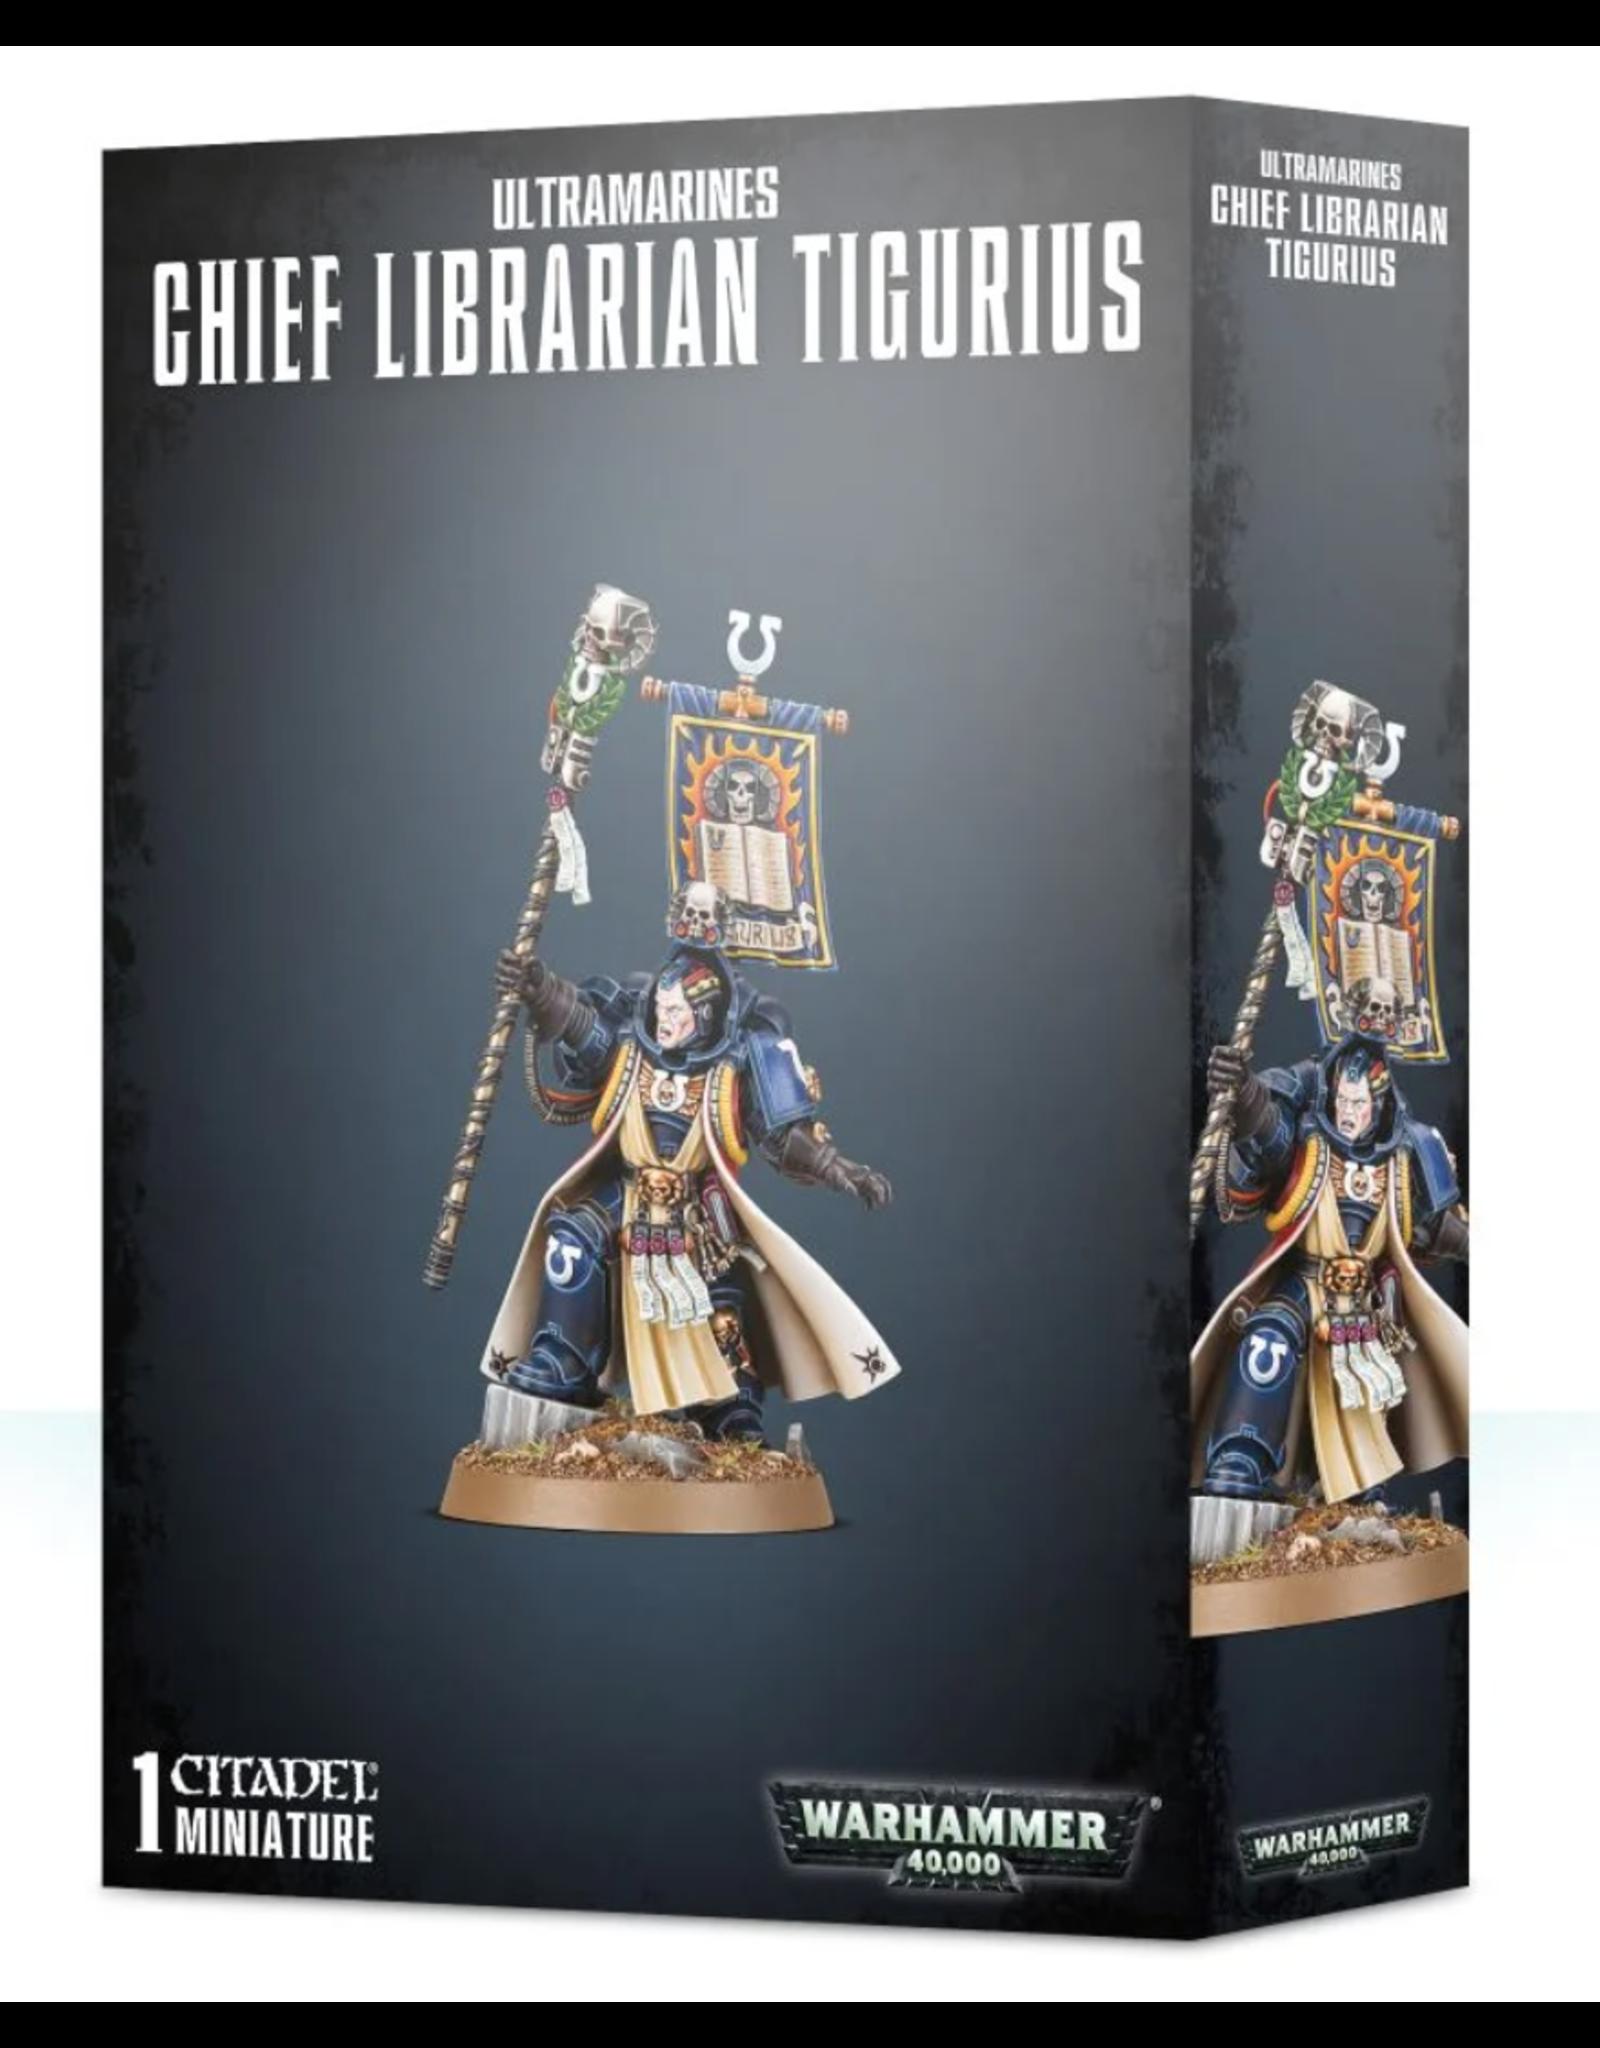 Warhammer 40K Space Marine Ultramarines Chief Librarian Tigurius